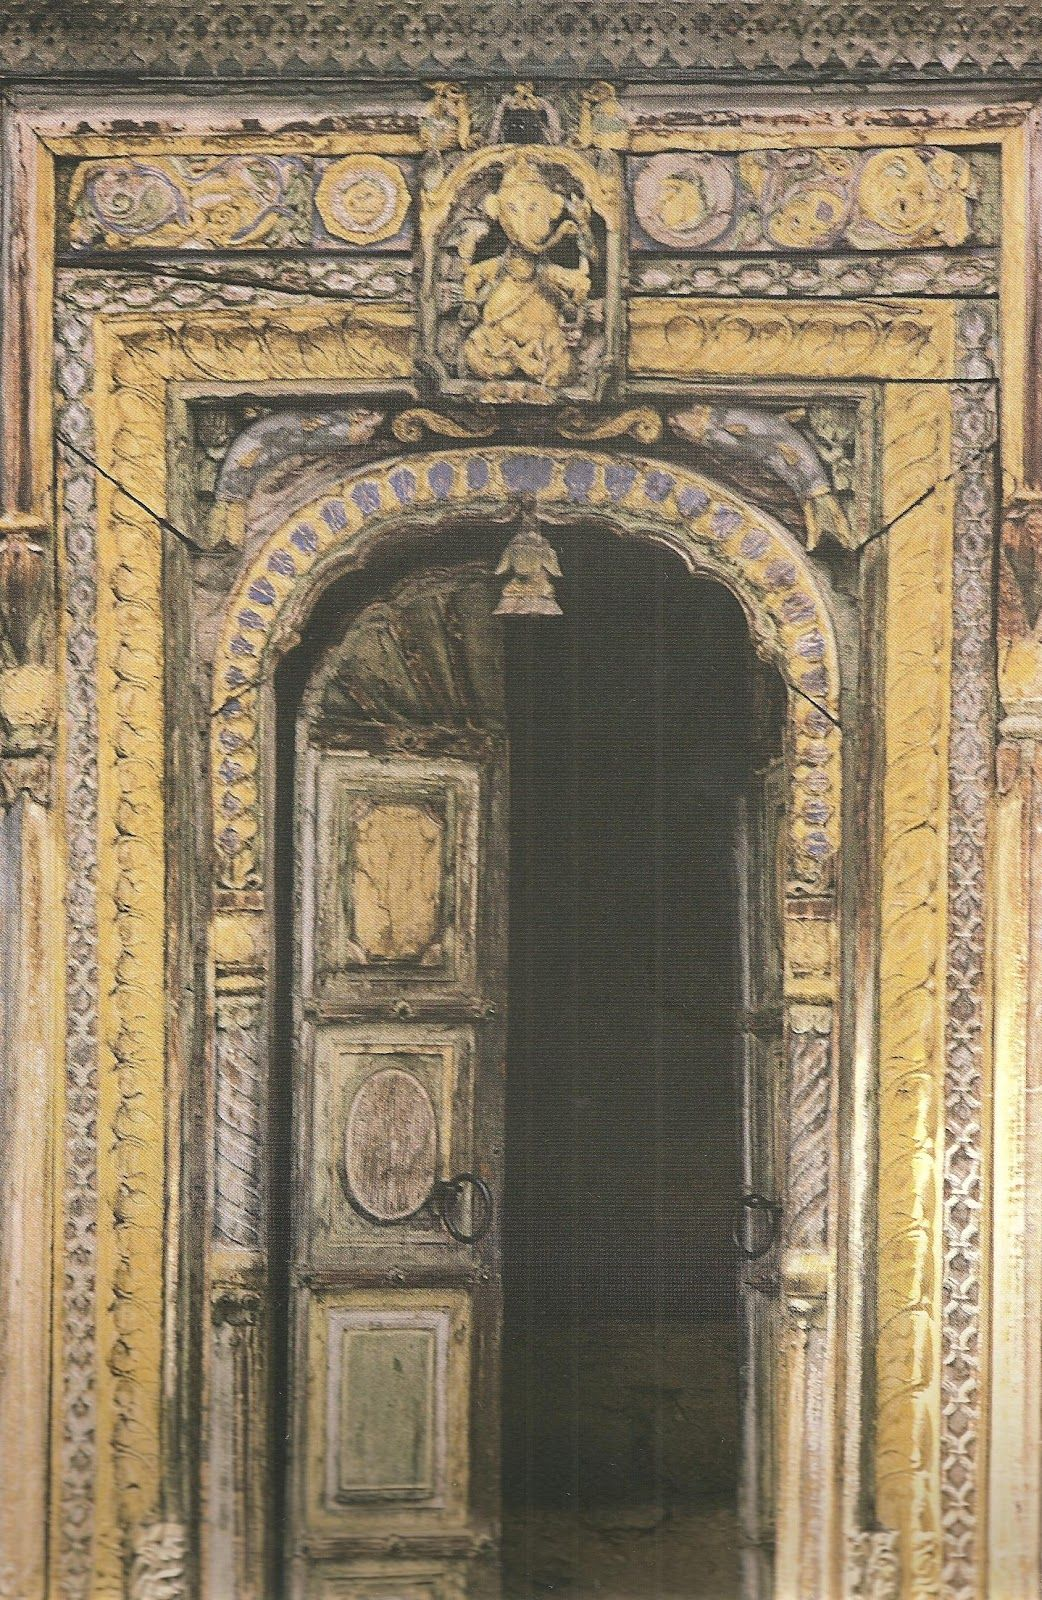 Puertas antiguas de madera guatemala buscar con google for Puertas interiores antiguas madera